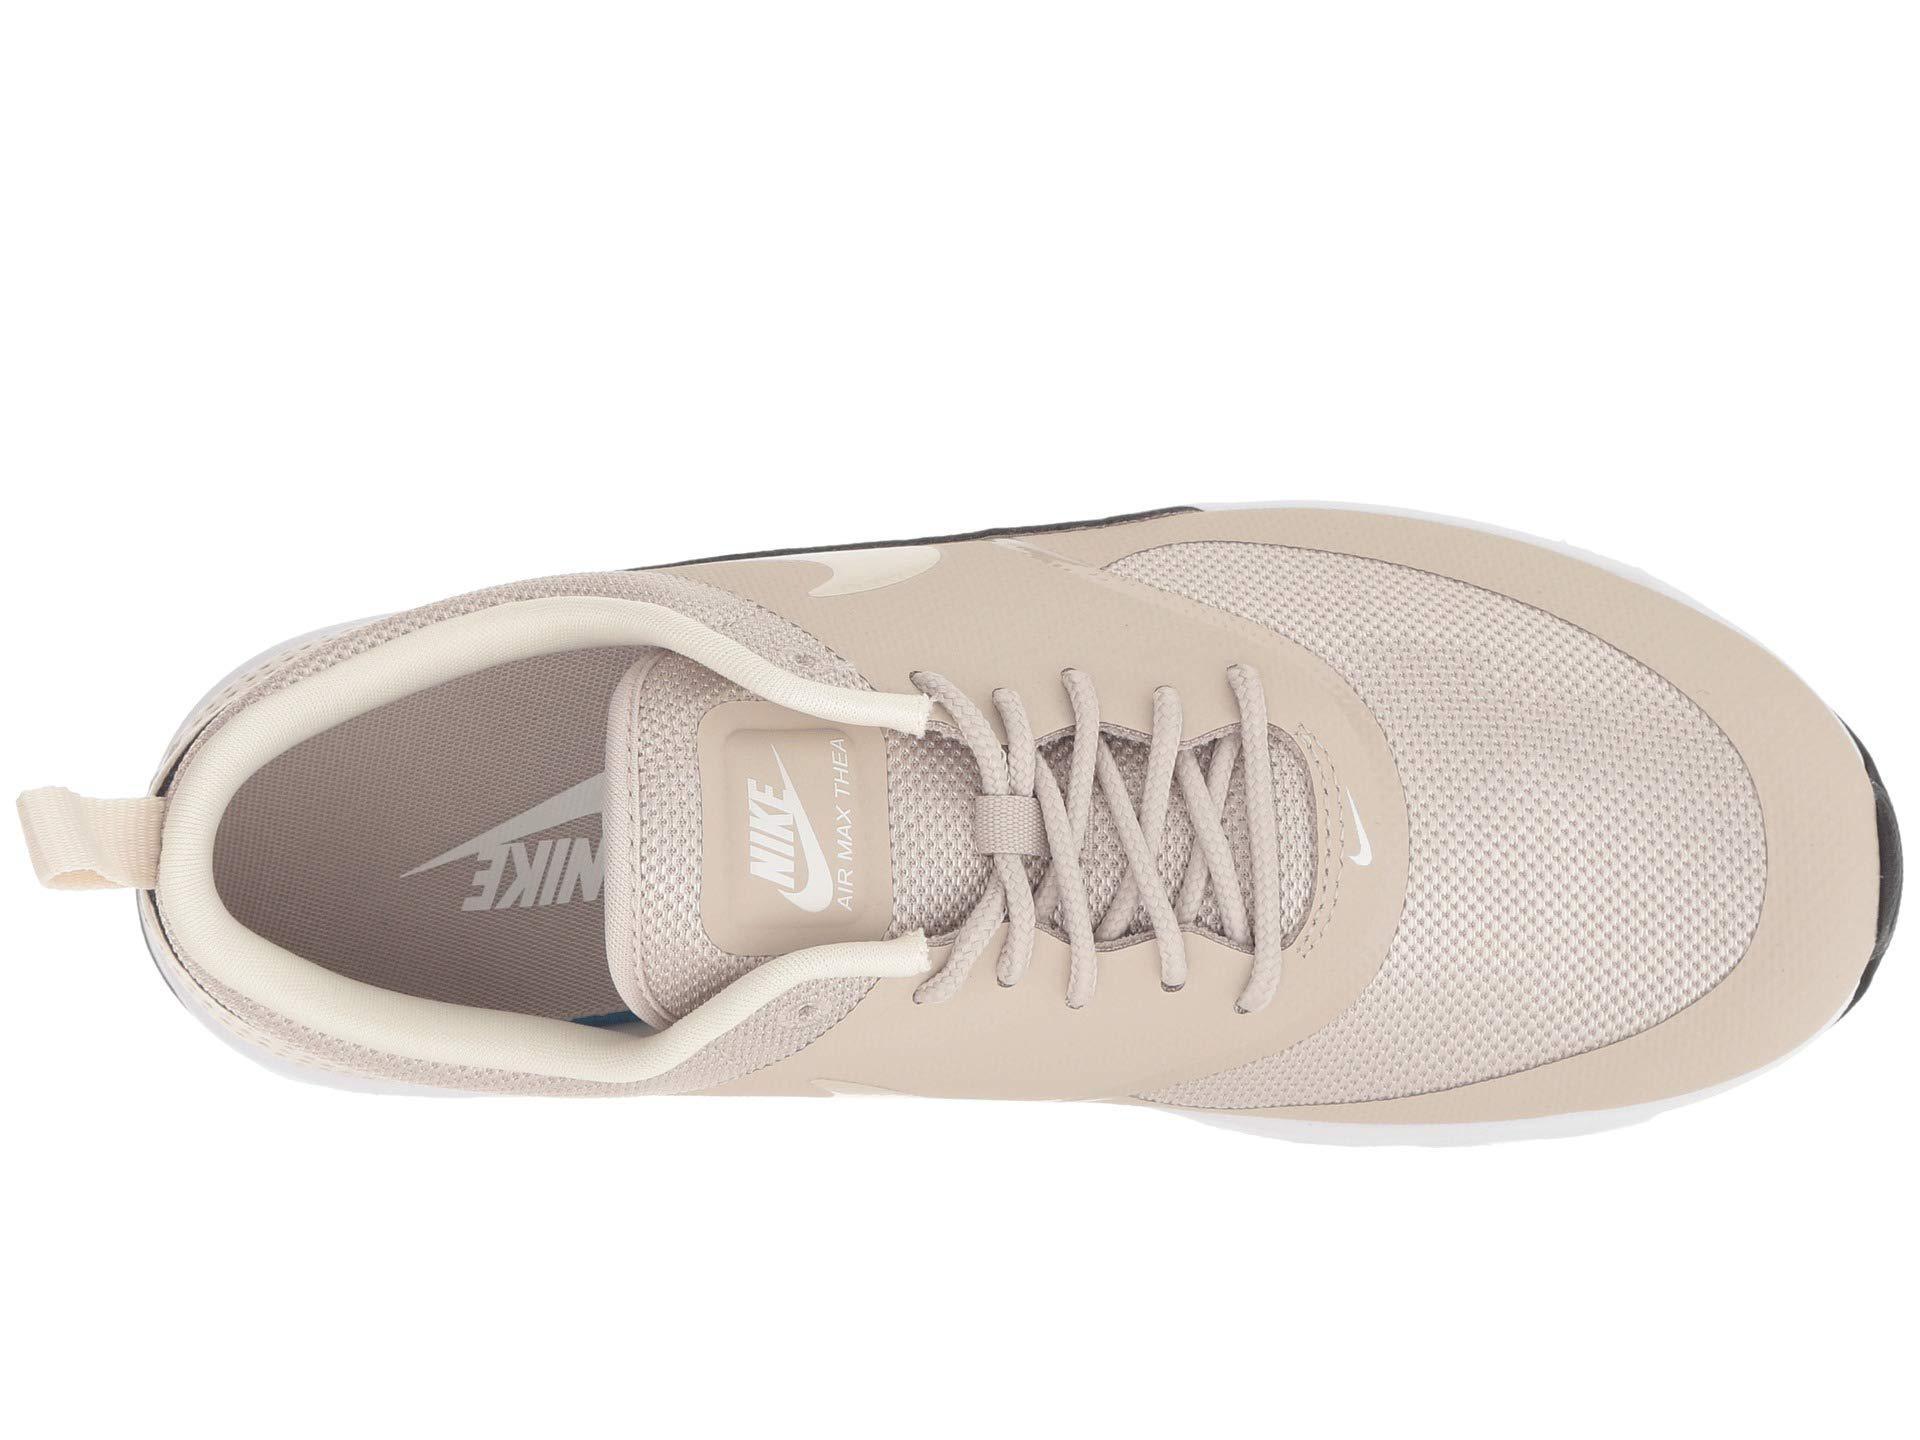 Nike Pink Air Max Thea (stringlight Creamblackwhite) Women's Shoes